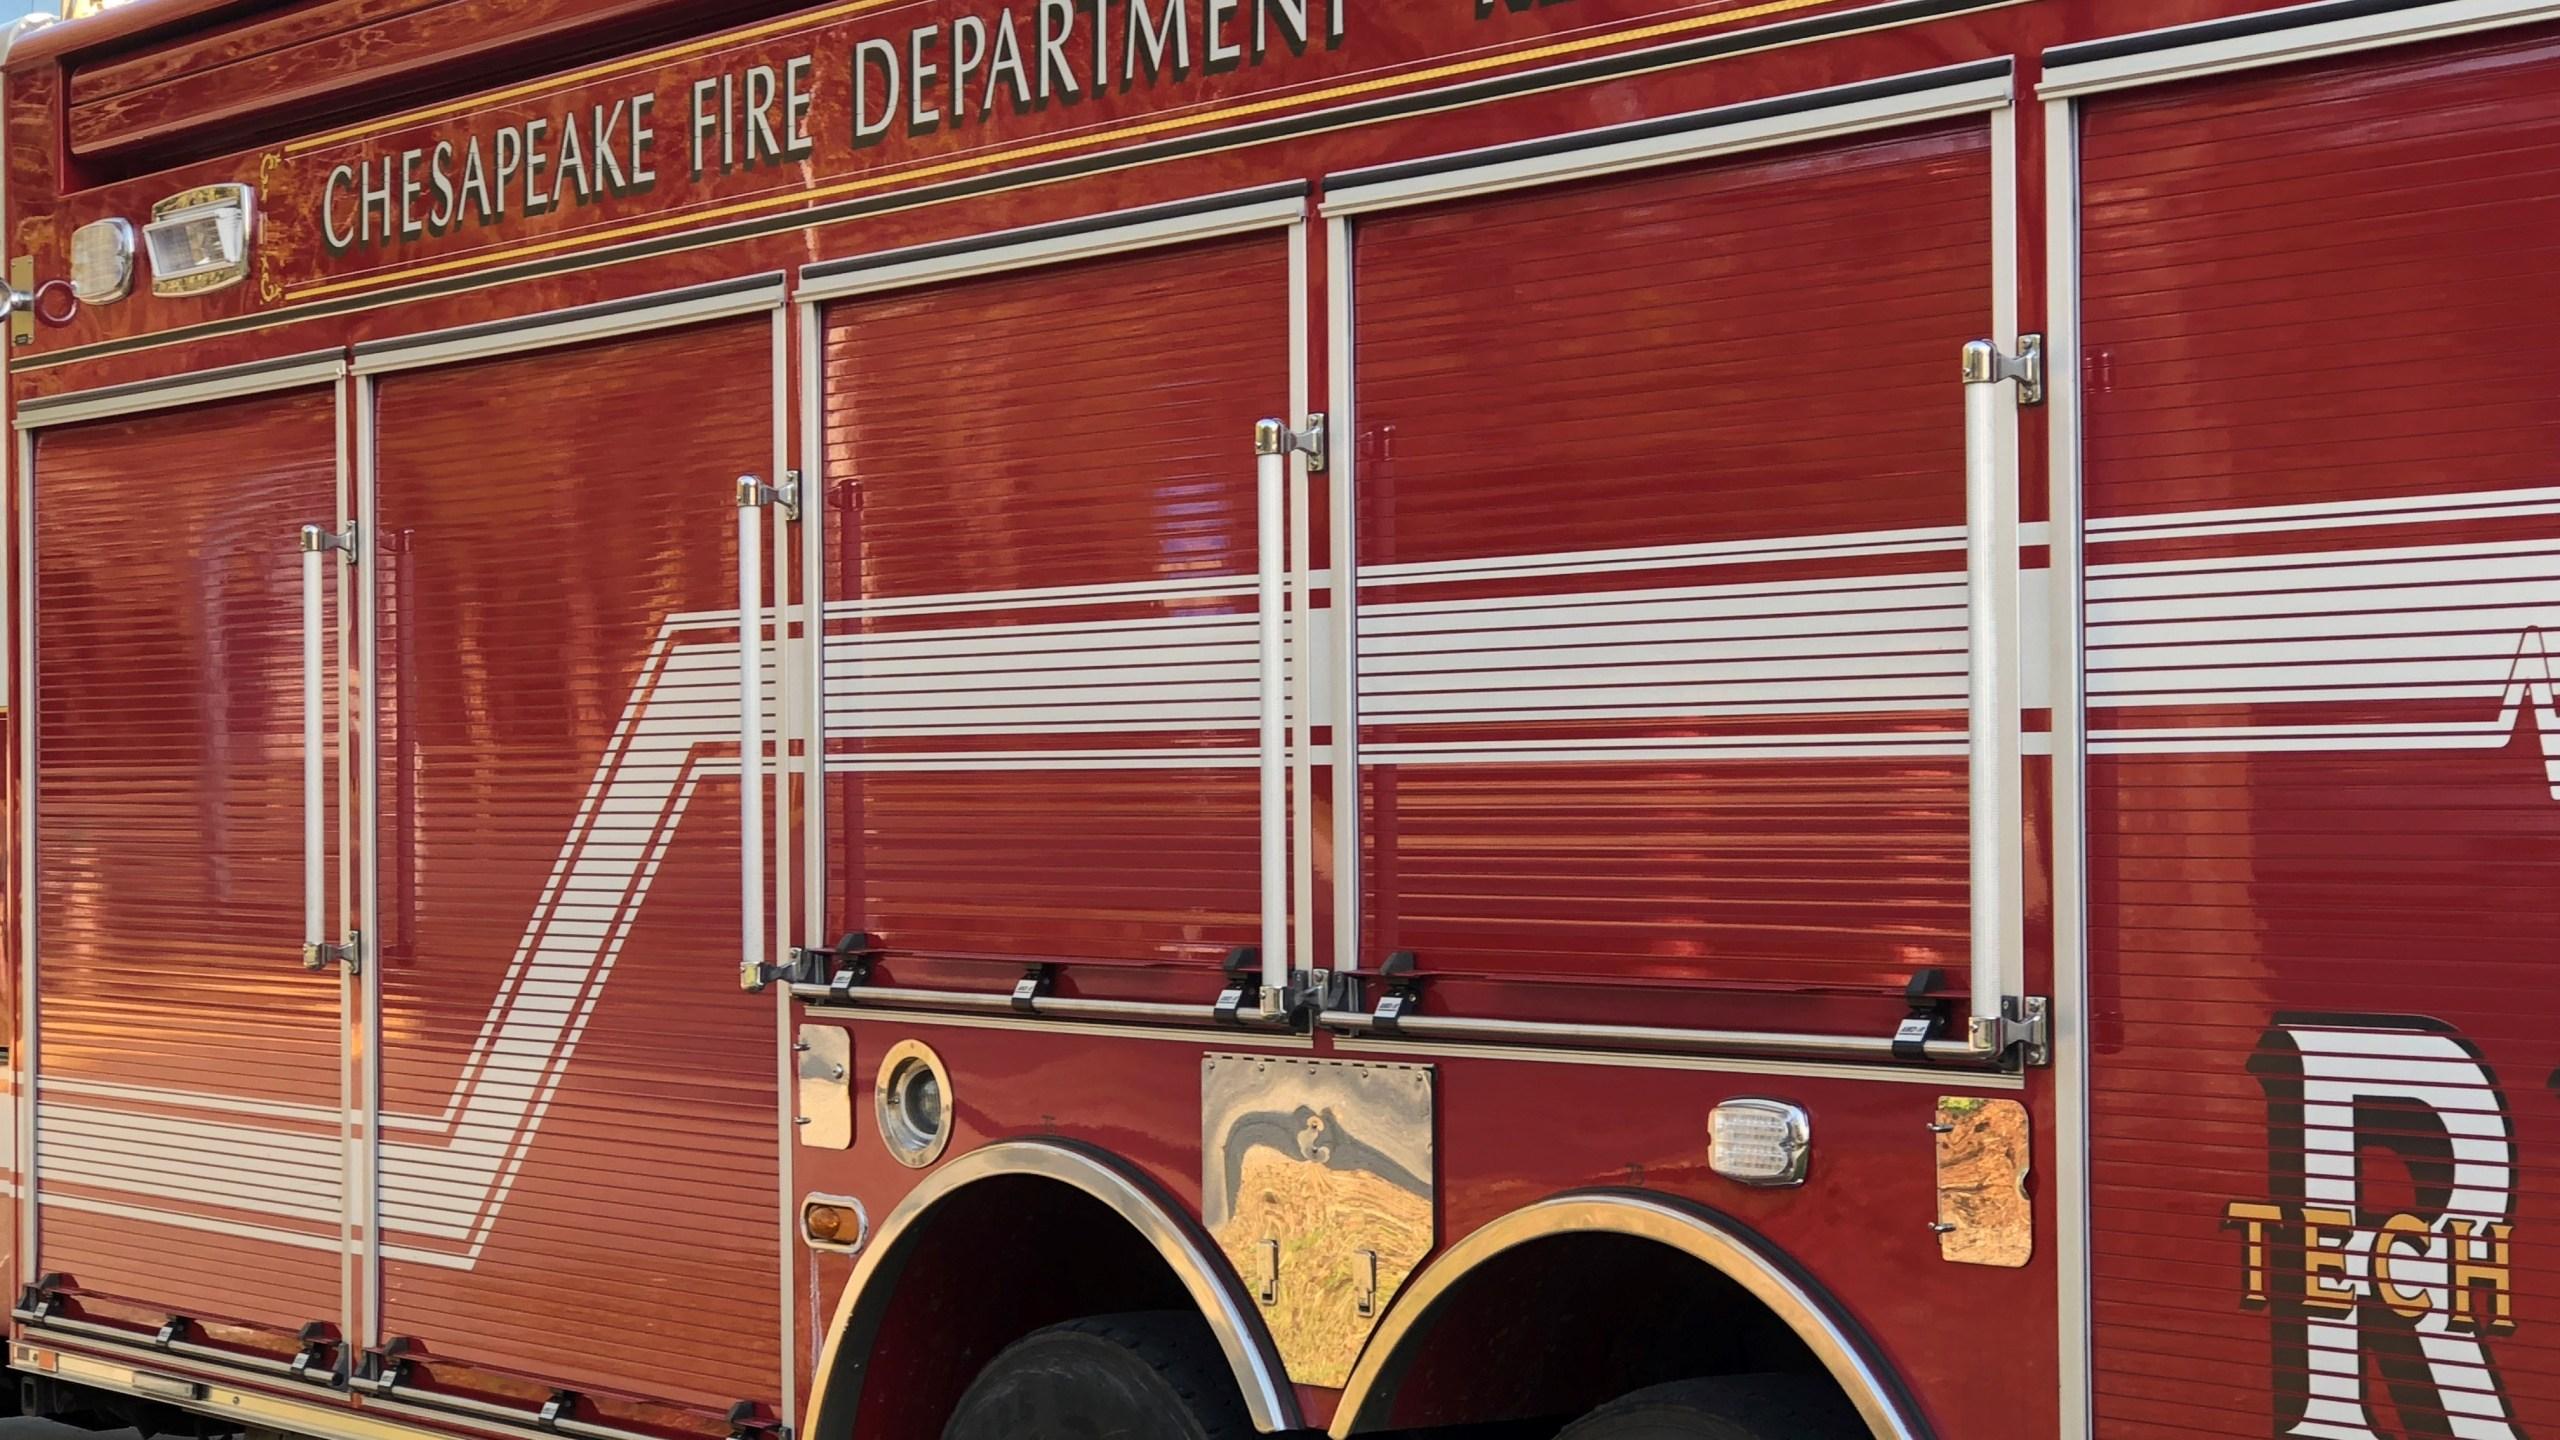 Chesapeake Fire and Rescue Generic